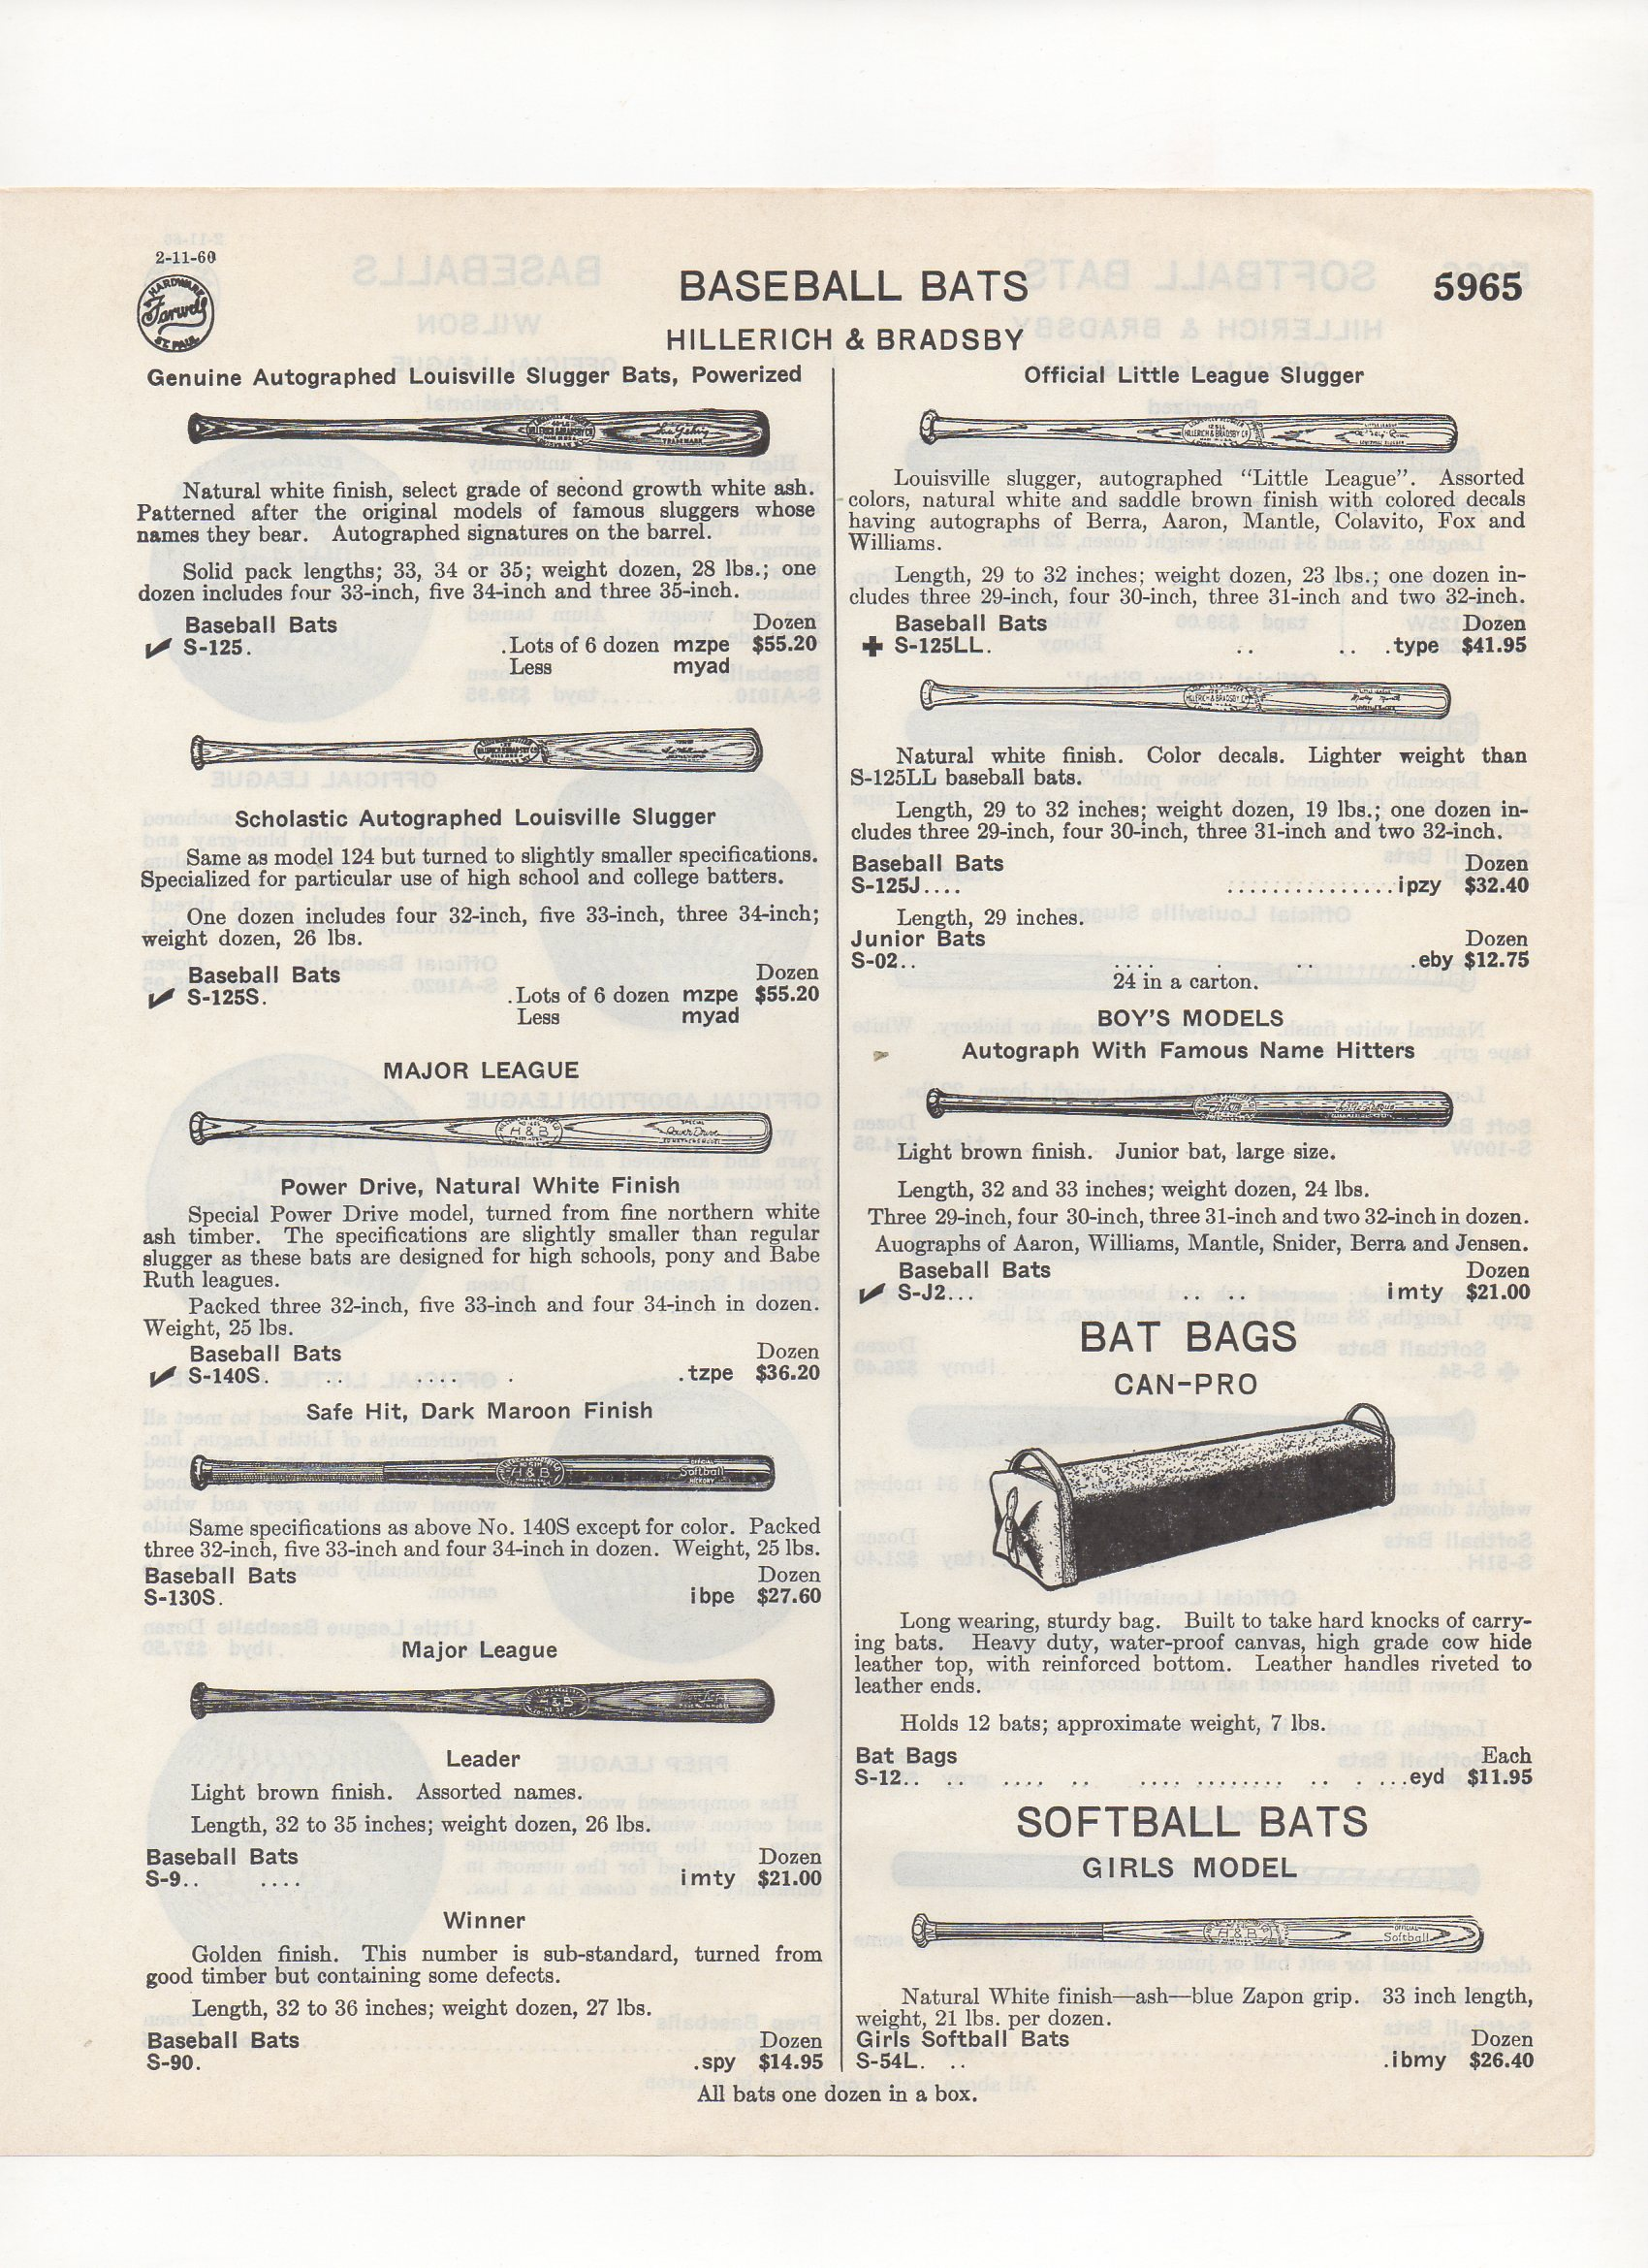 1960 farwell hardware, st. paul, minnesota, catalog